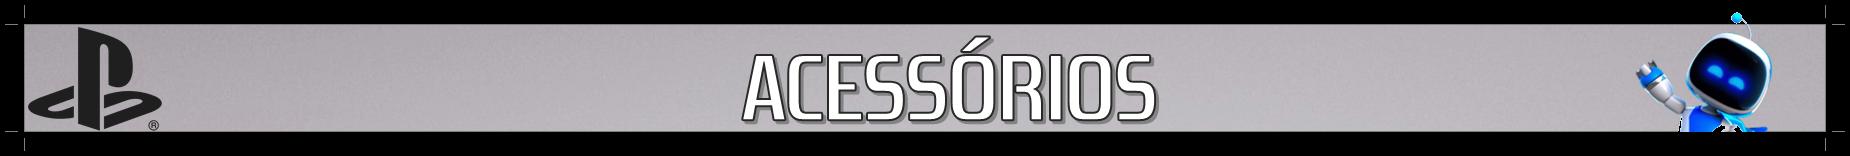 acess-1.png